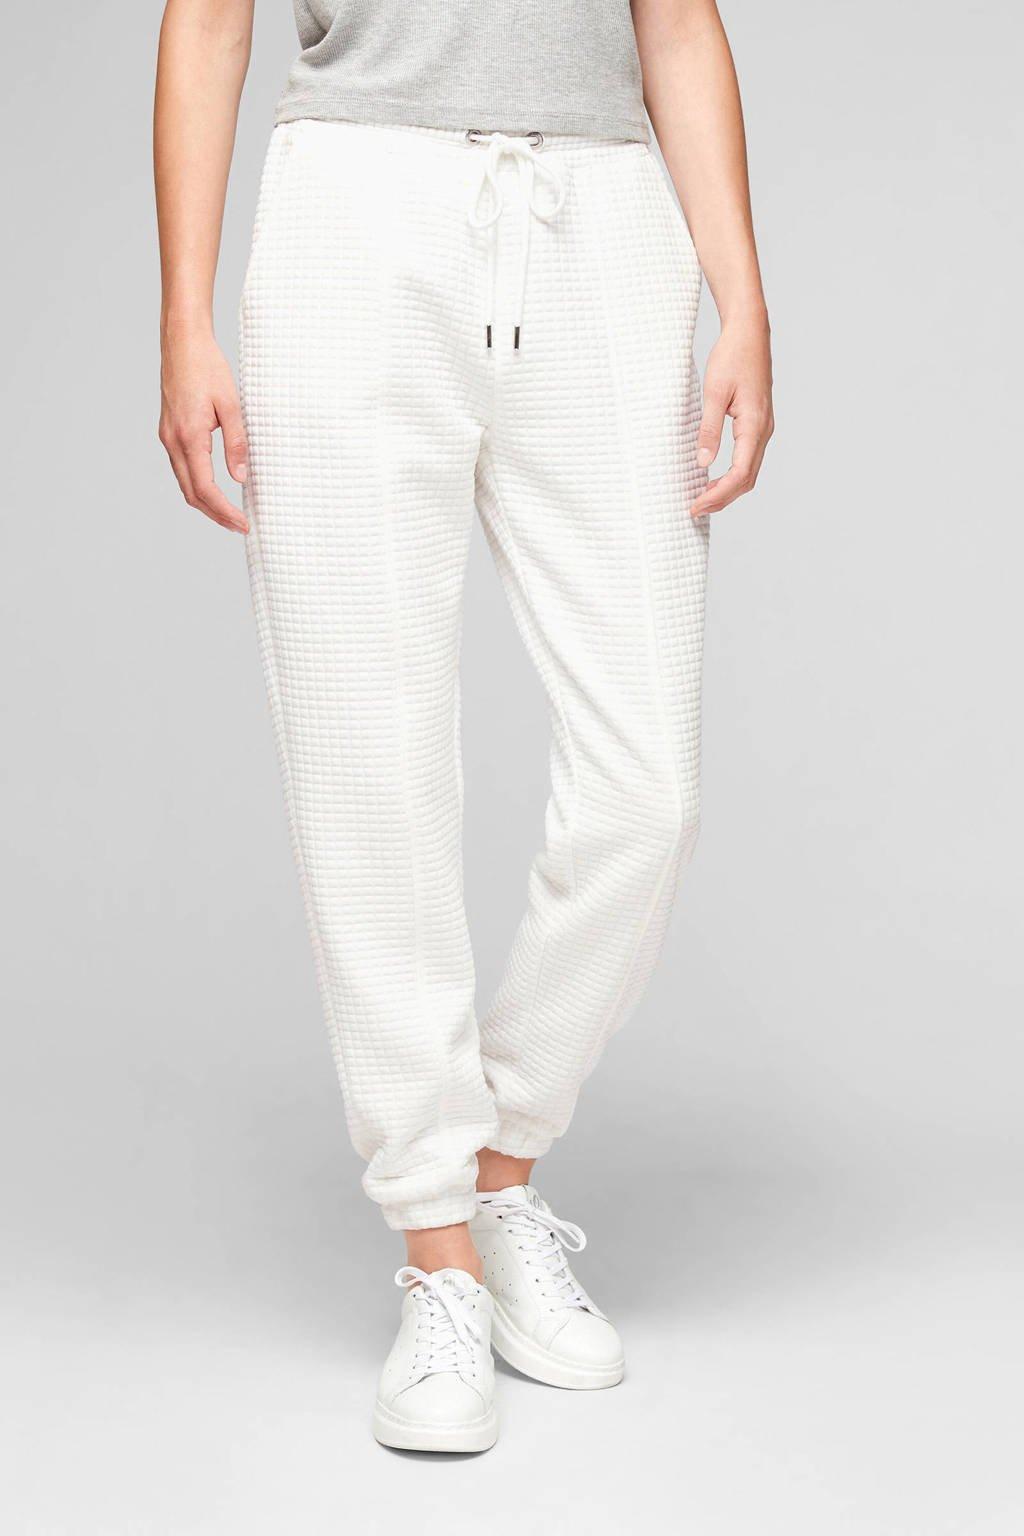 Q/S designed by tapered fit broek met textuur wit, Wit